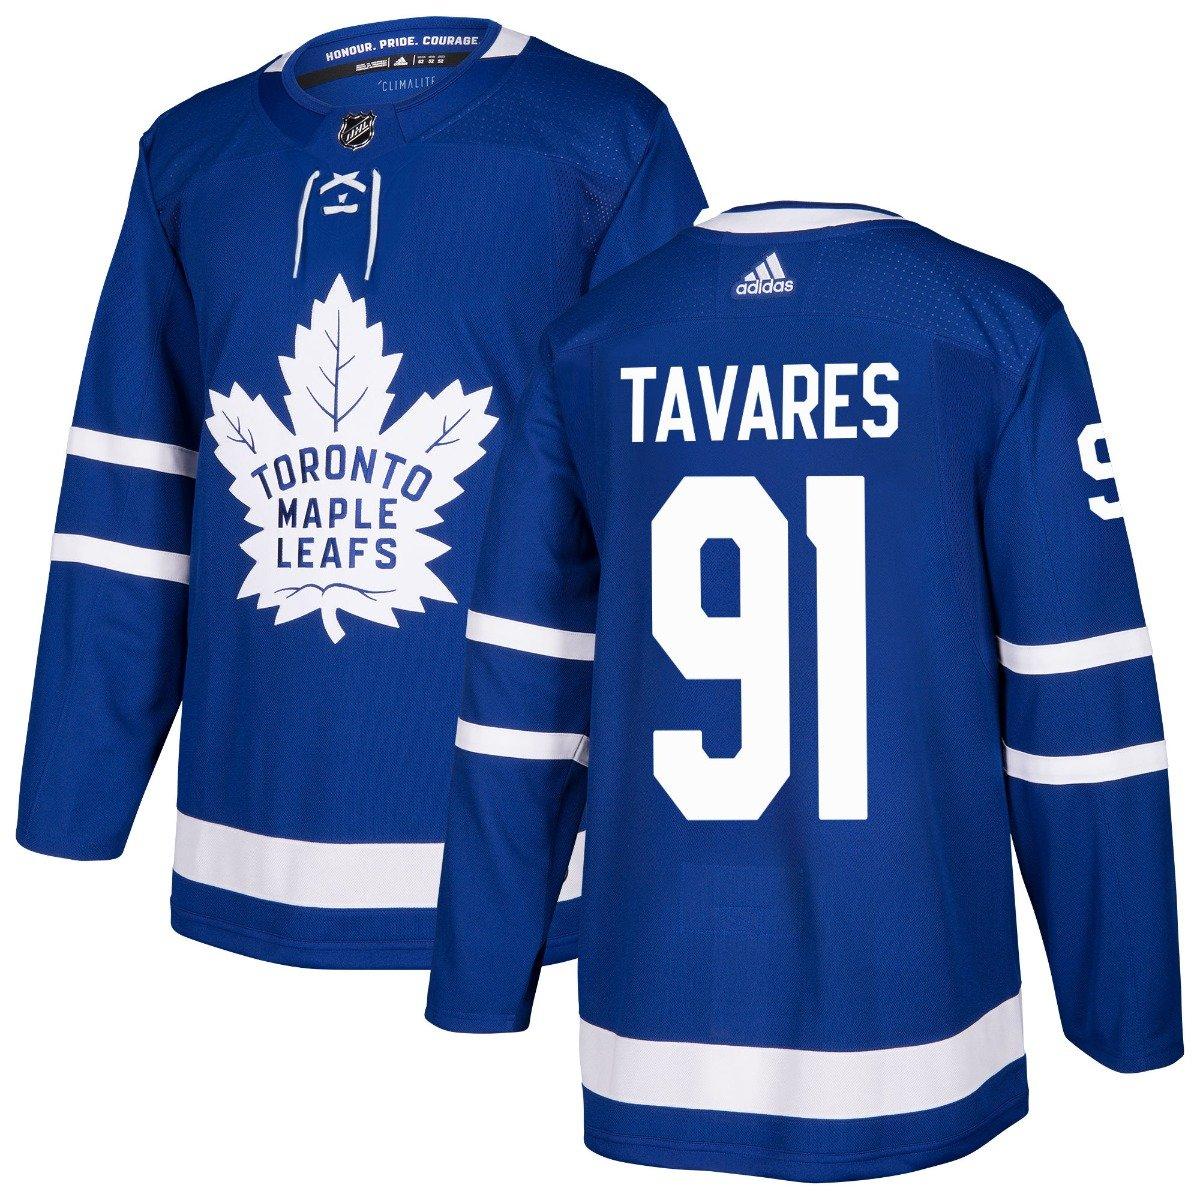 check out 89772 09a13 Amazon.com : adidas John Tavares Toronto Maple Leafs NHL ...